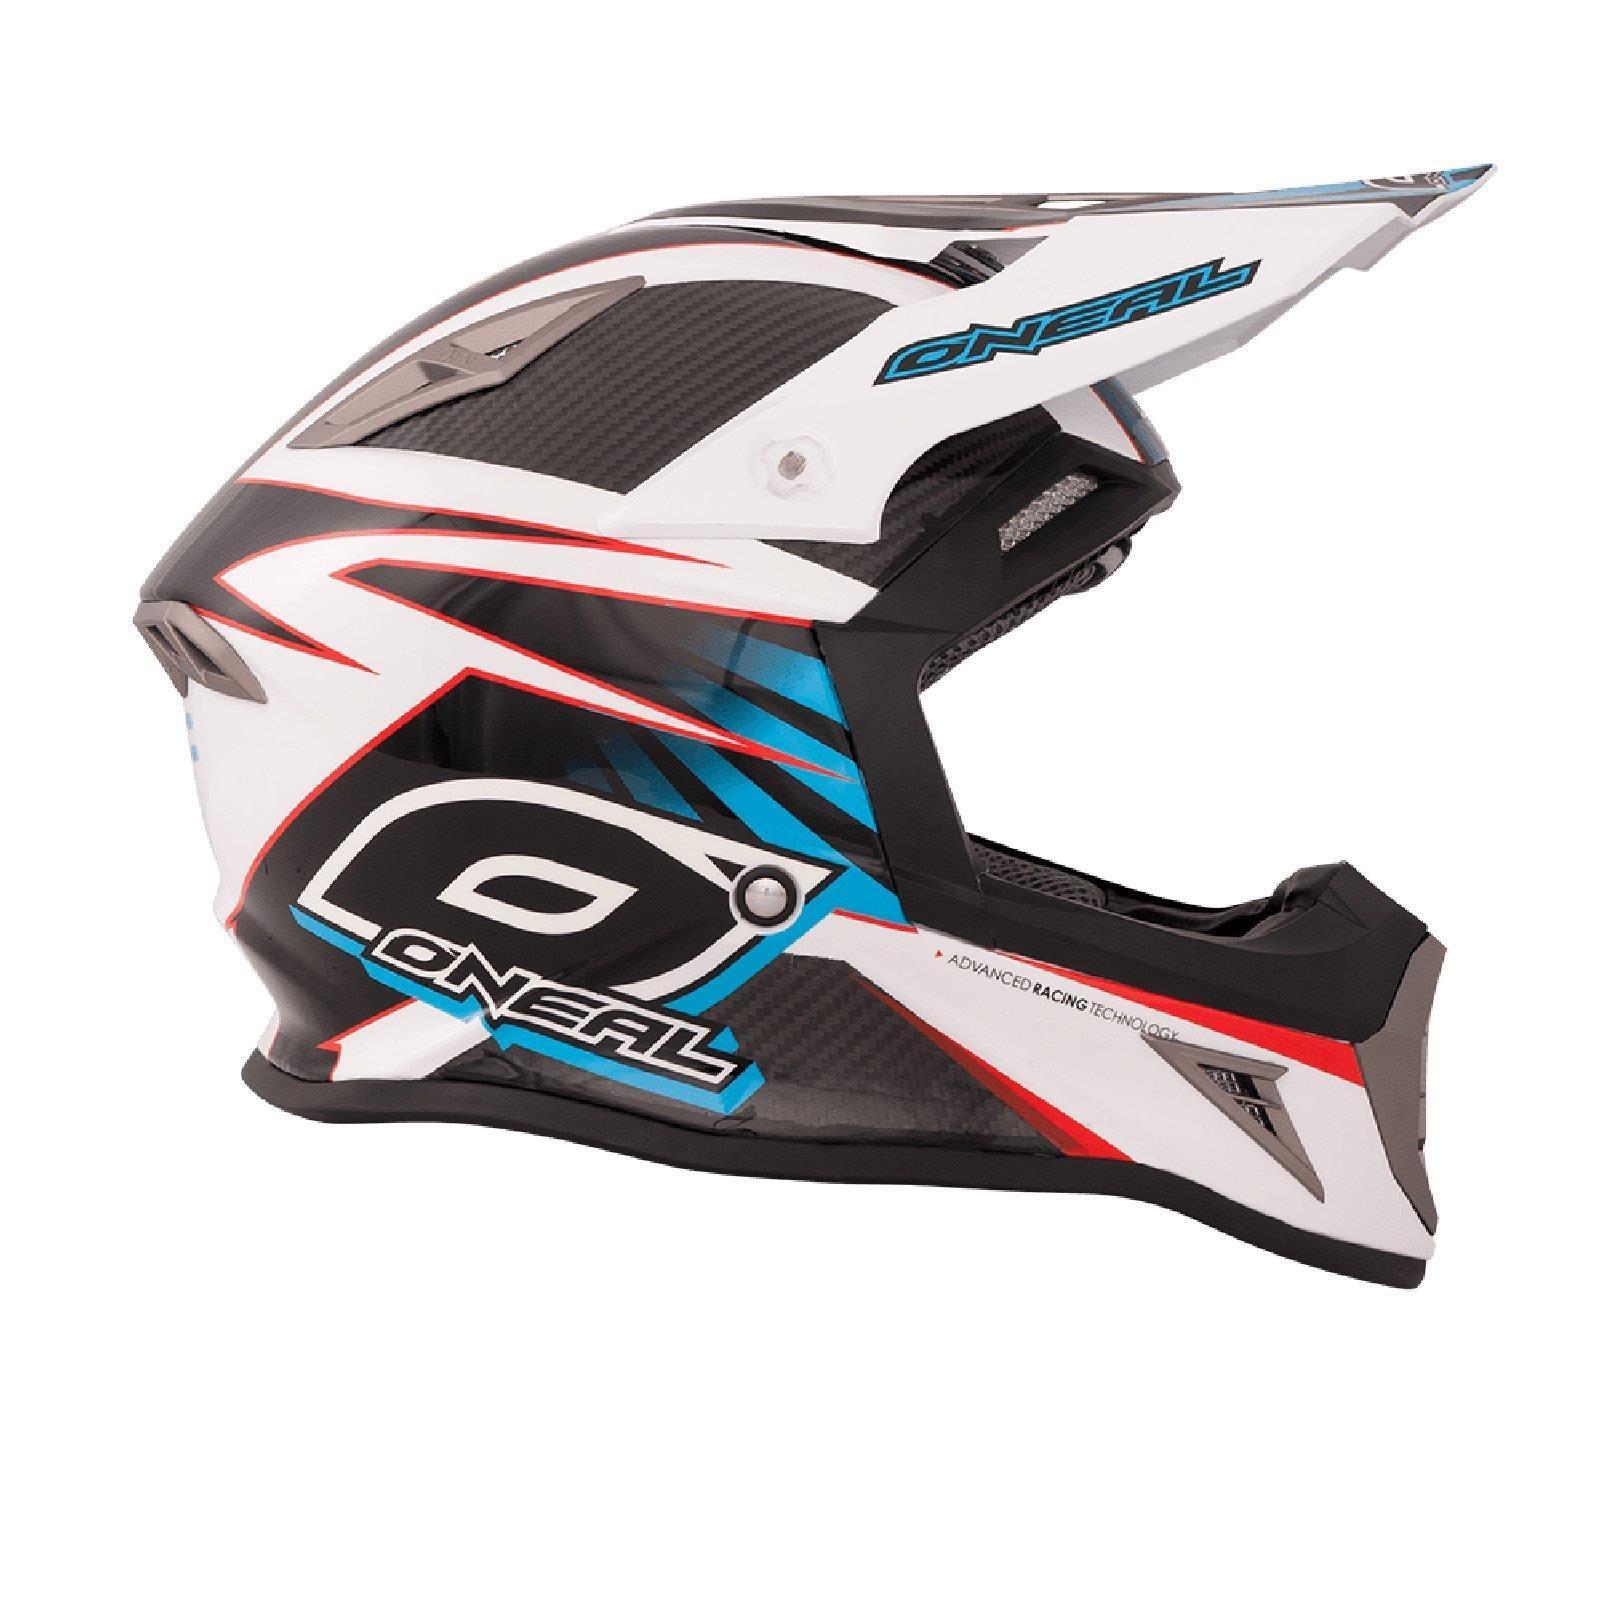 ONeal-Motocross-casco-MX-ENDURO-MOTO-BICI-FUORISTRADA-CROSS-Series-Adventure miniatura 112